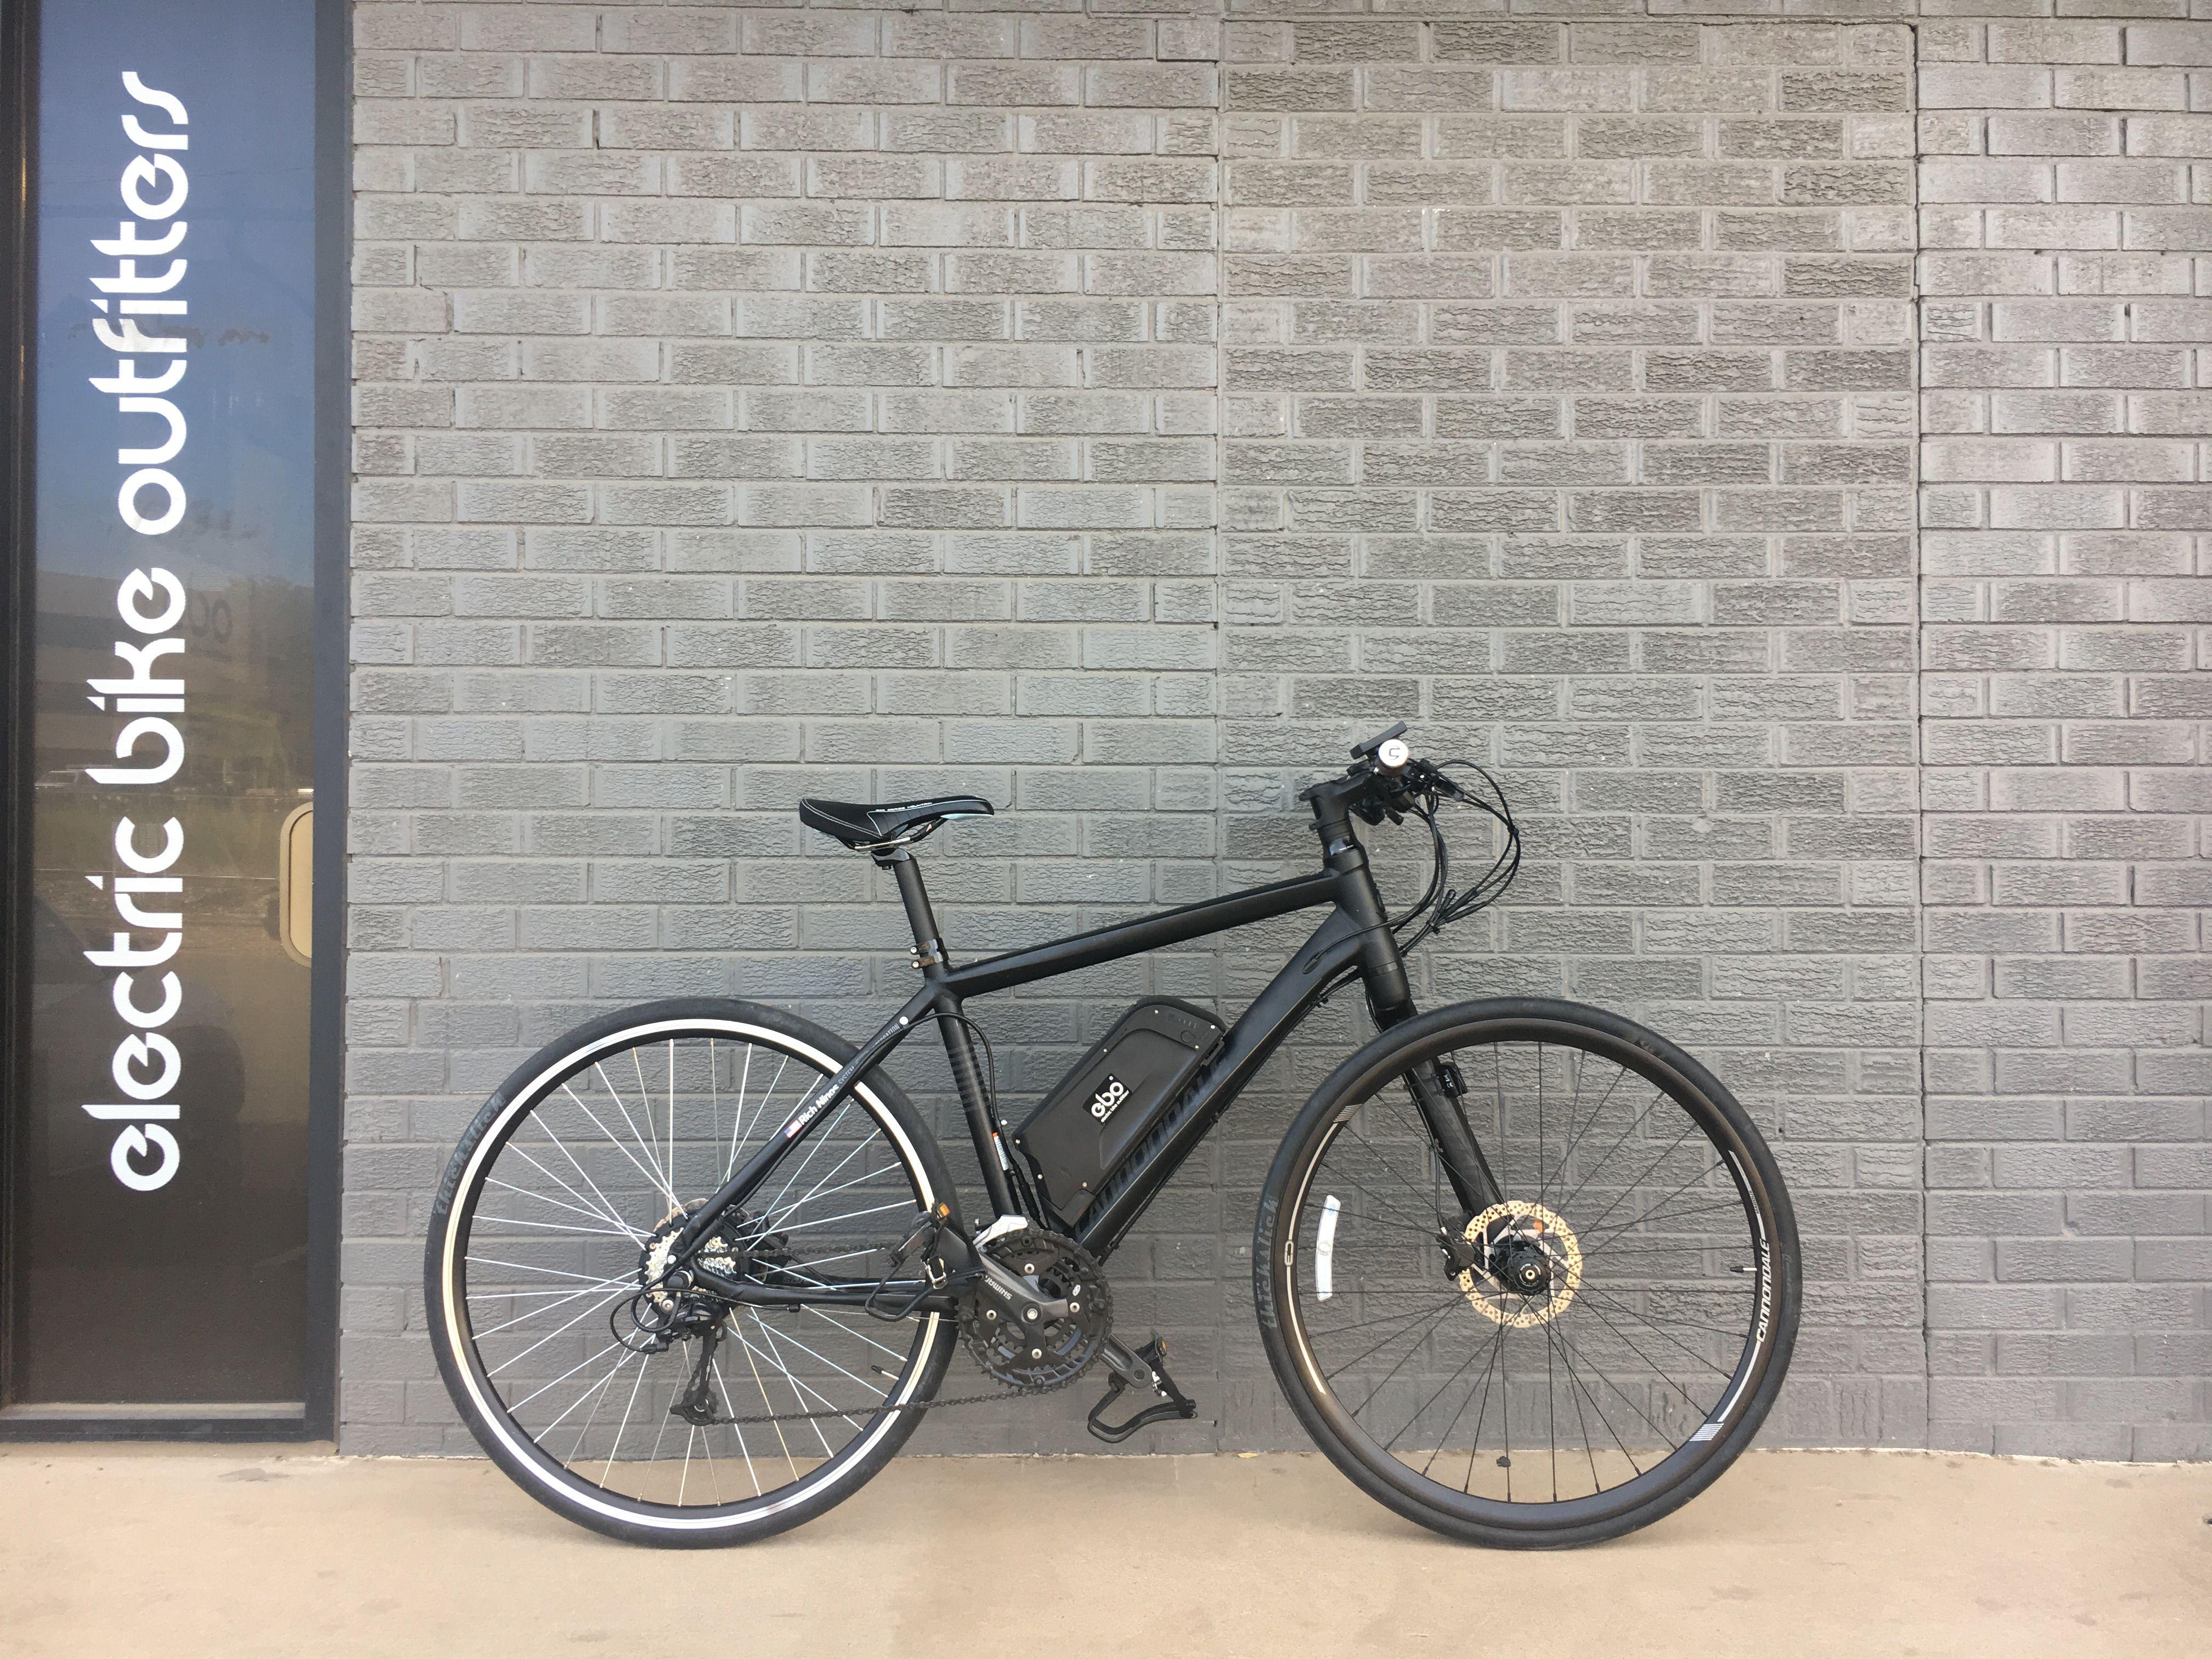 Ebo Burly Kit Installed On A Cannondale Bad Boy Cannondale Bad Boy Cannondale Electric Bike